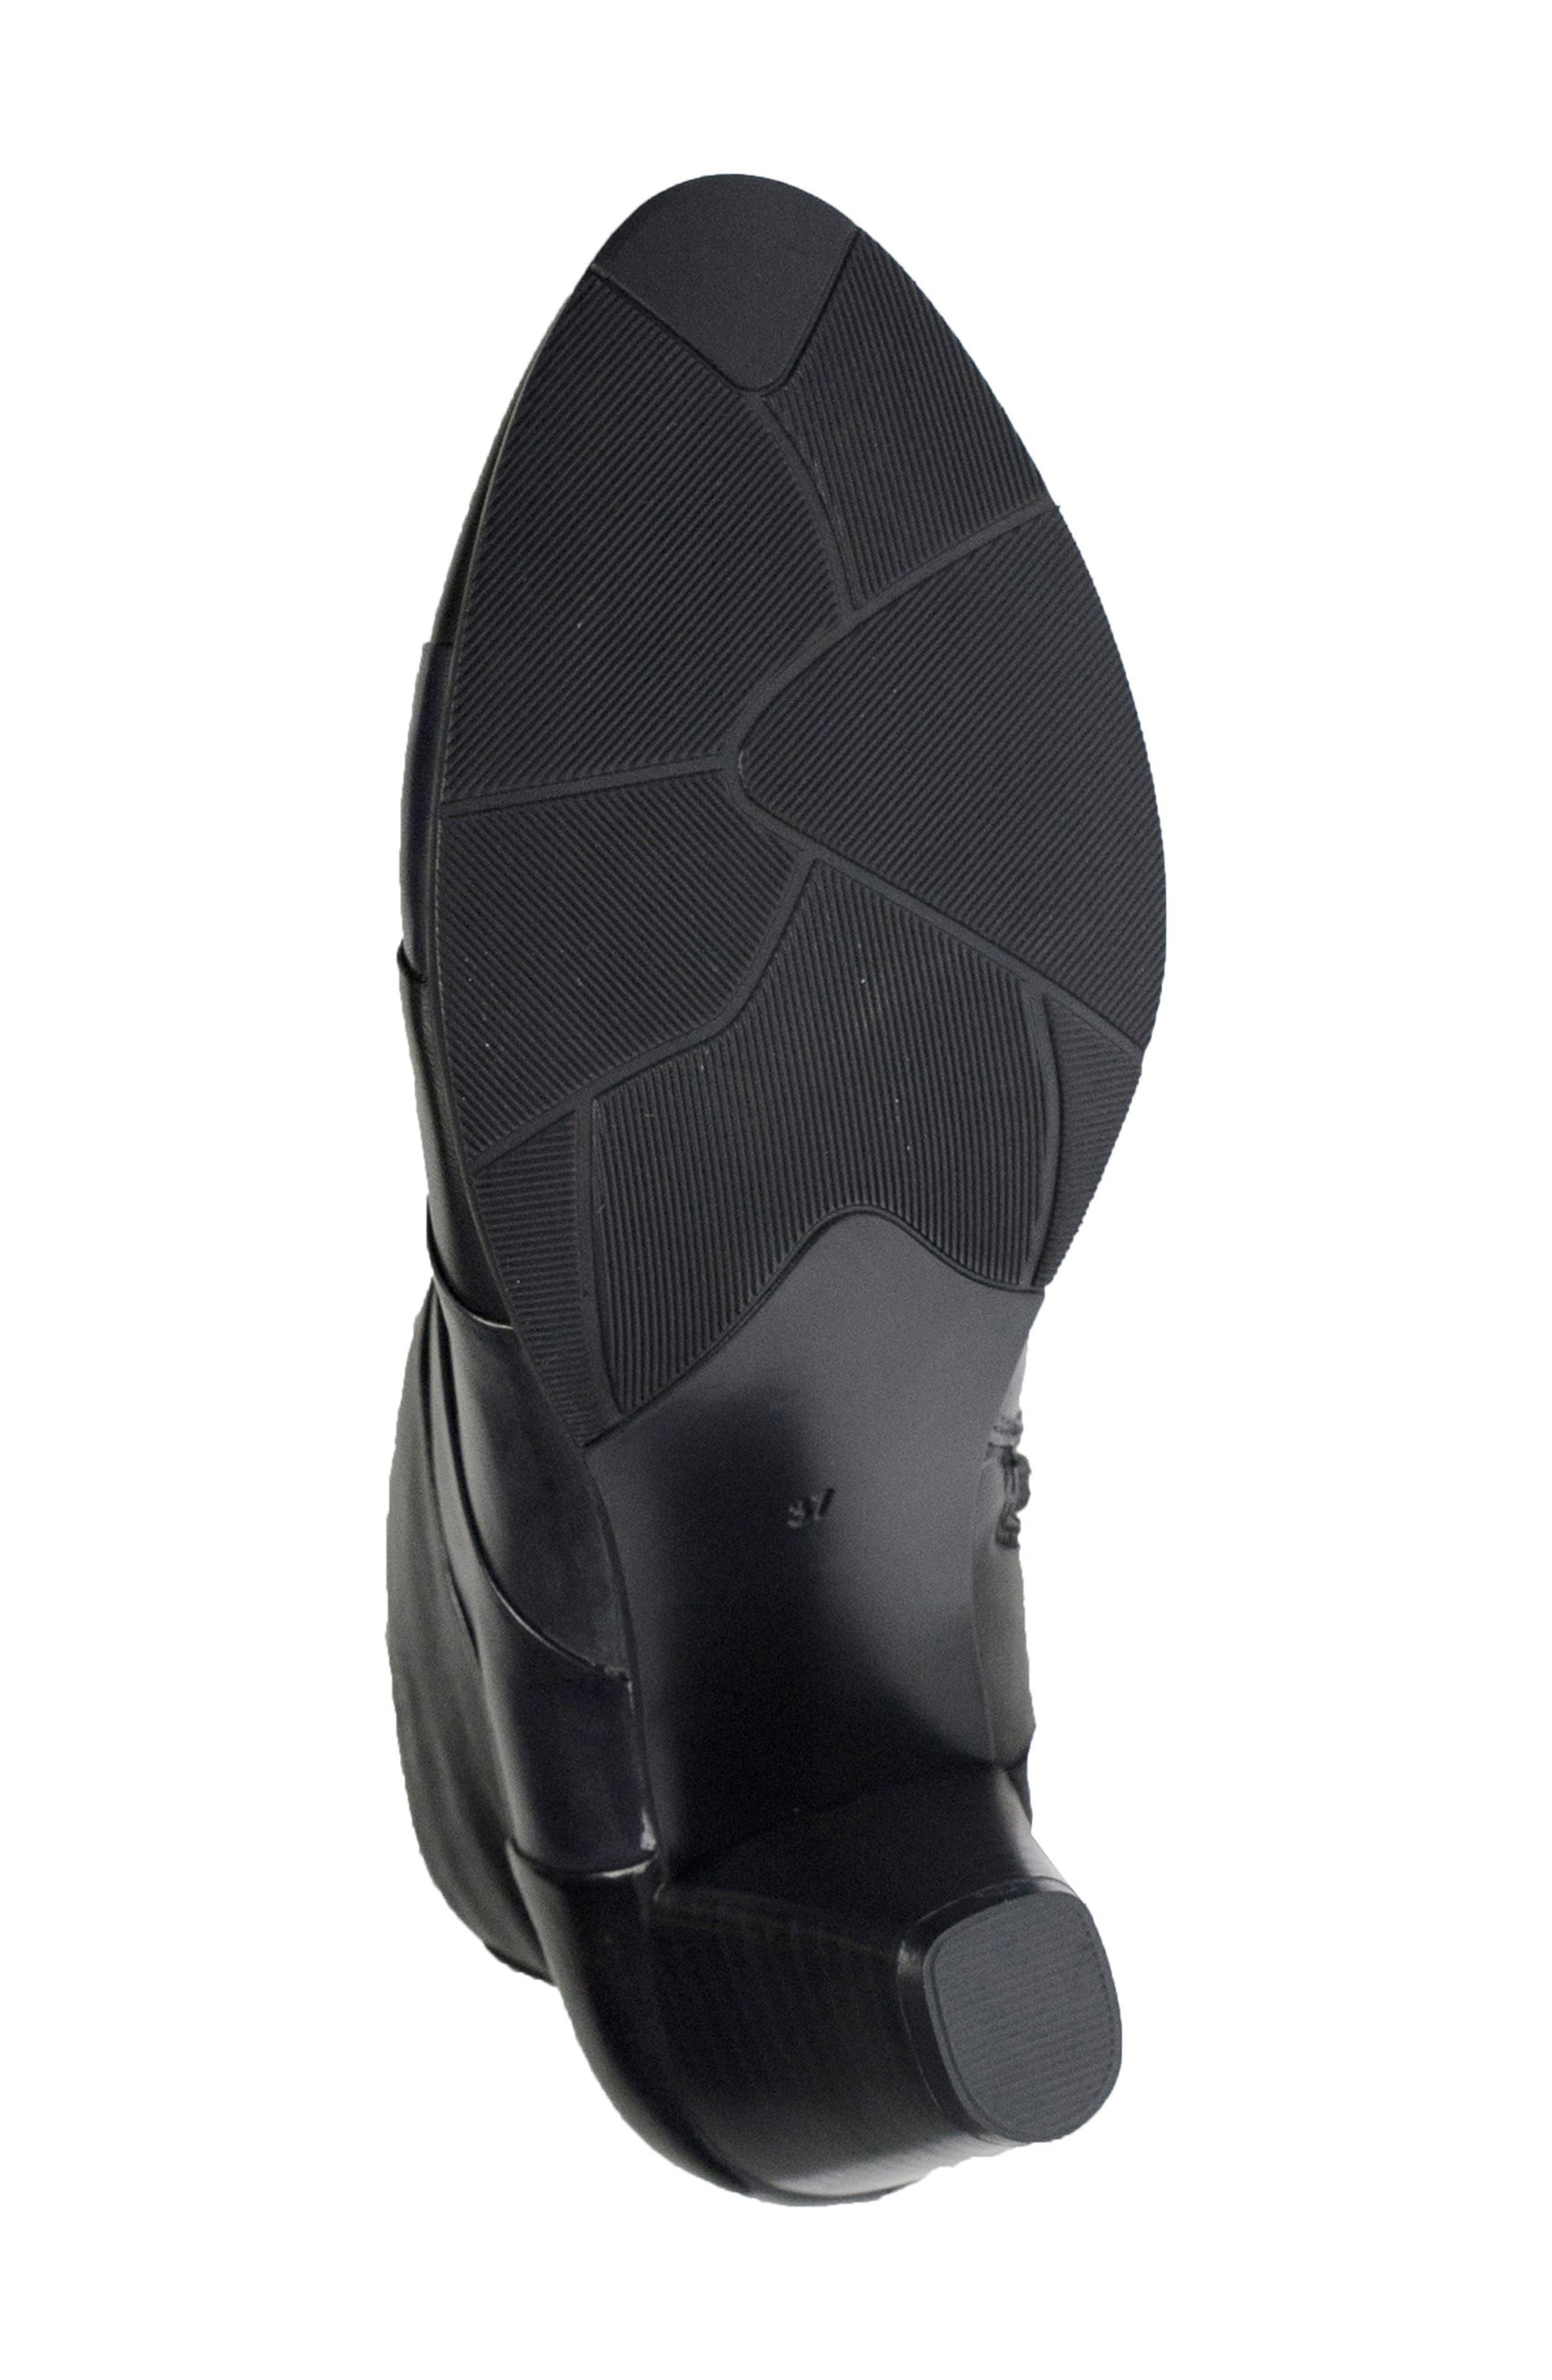 Binzo Bootie,                             Alternate thumbnail 5, color,                             Black Multi Leather